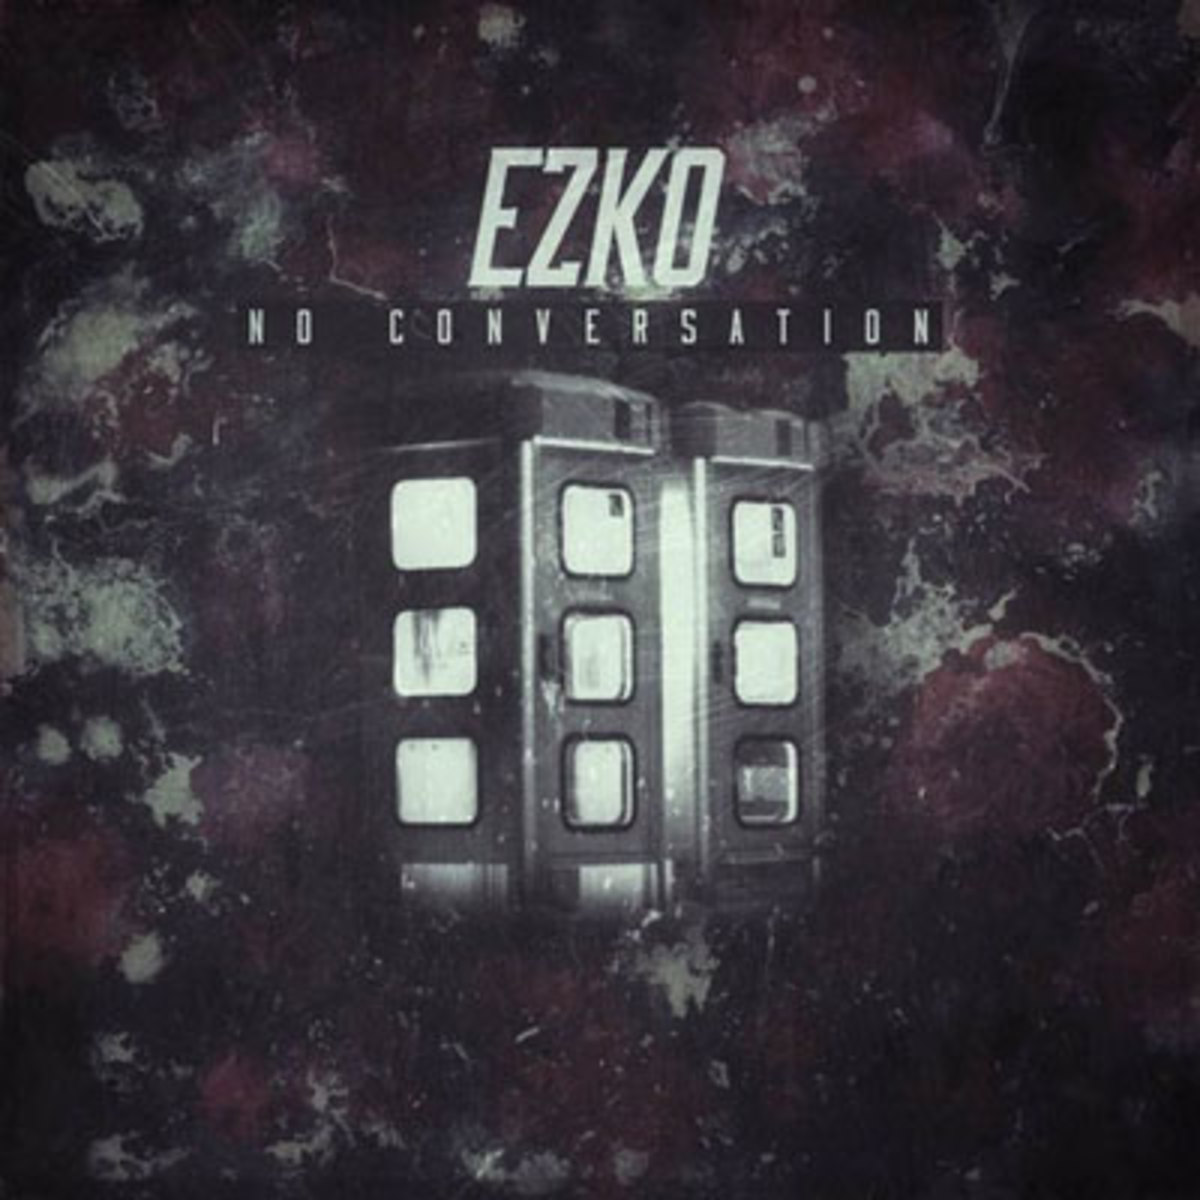 ezko-noconversation.jpg